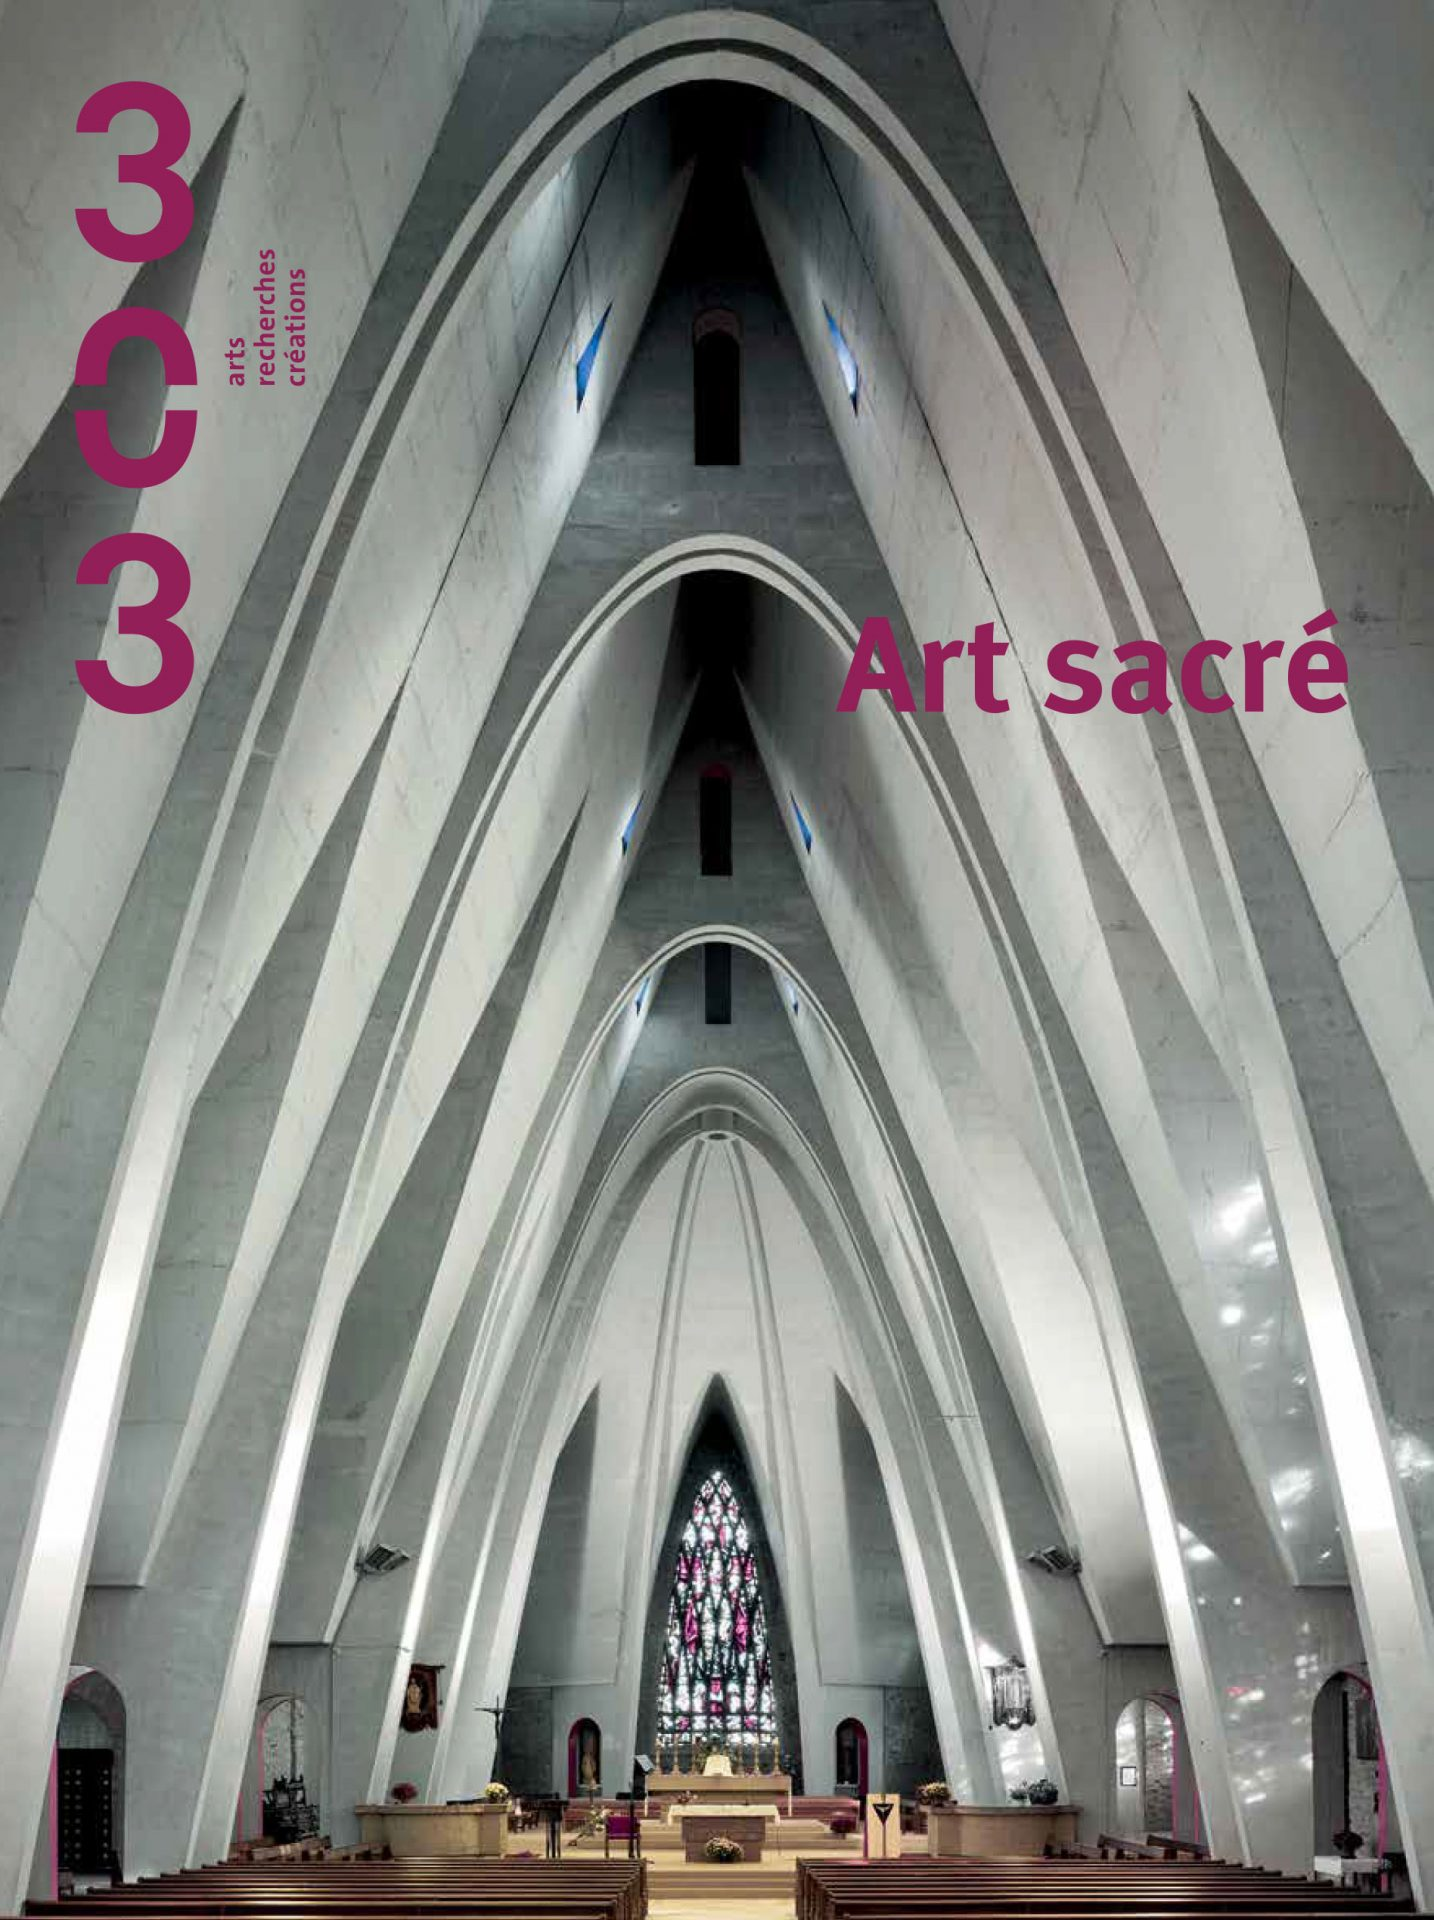 163-COUV-ART-SACRE